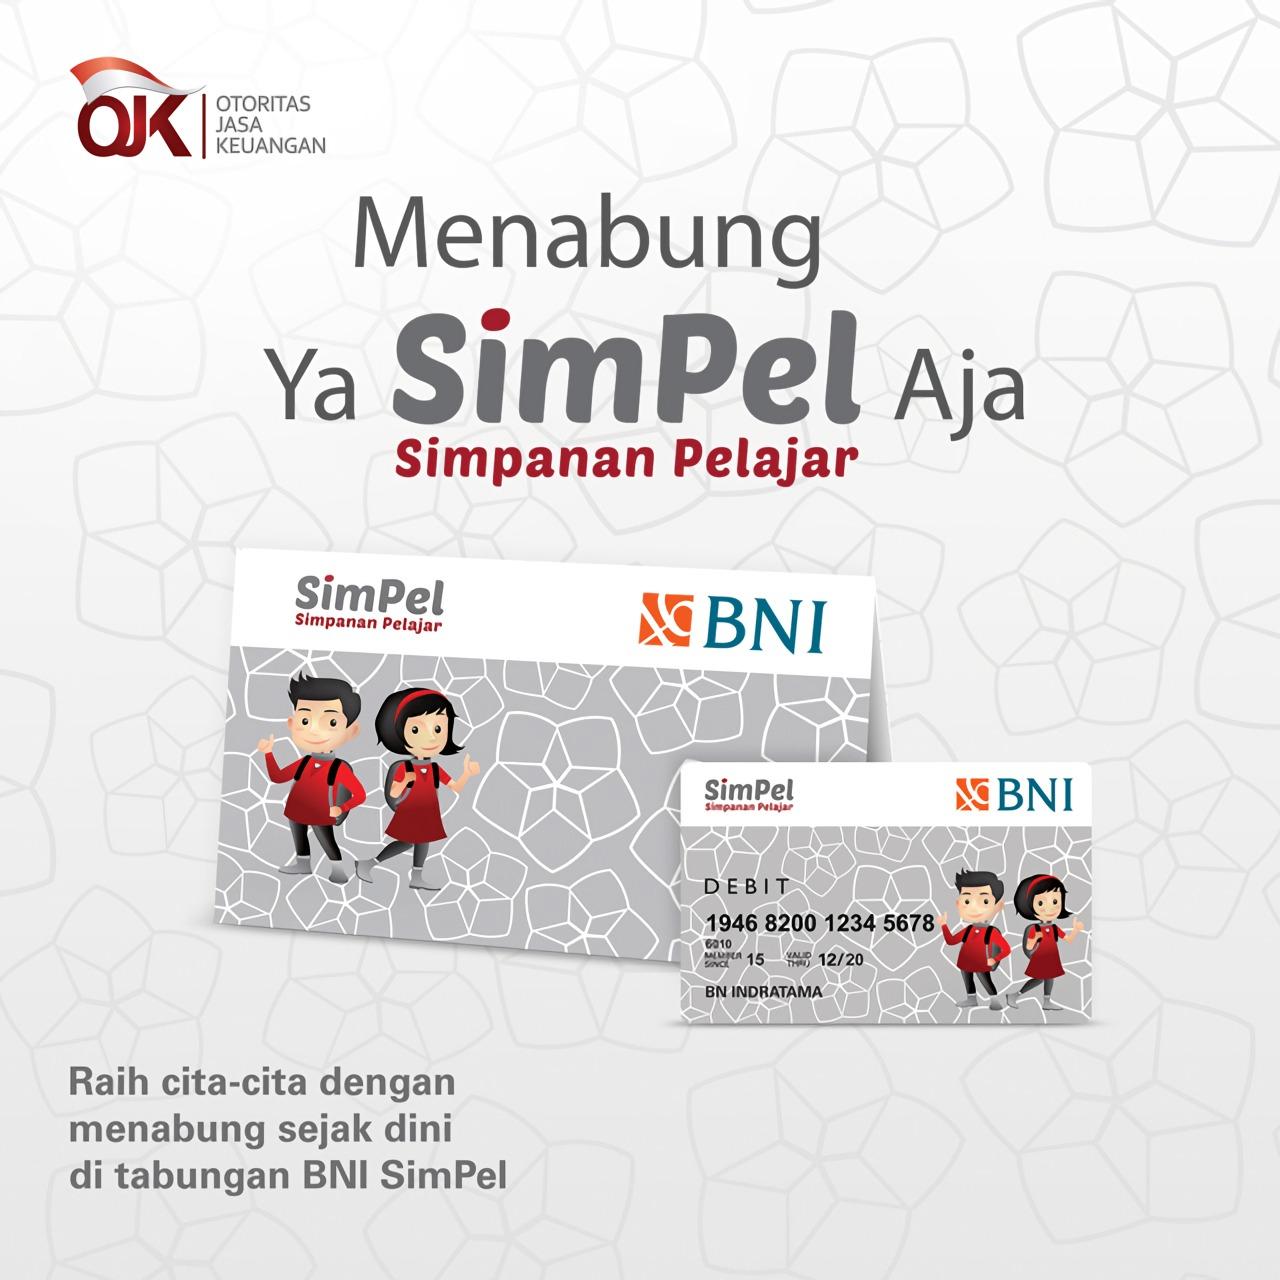 Cara dan Syarat Membuka Tabungan SimPel dari Bank BNI